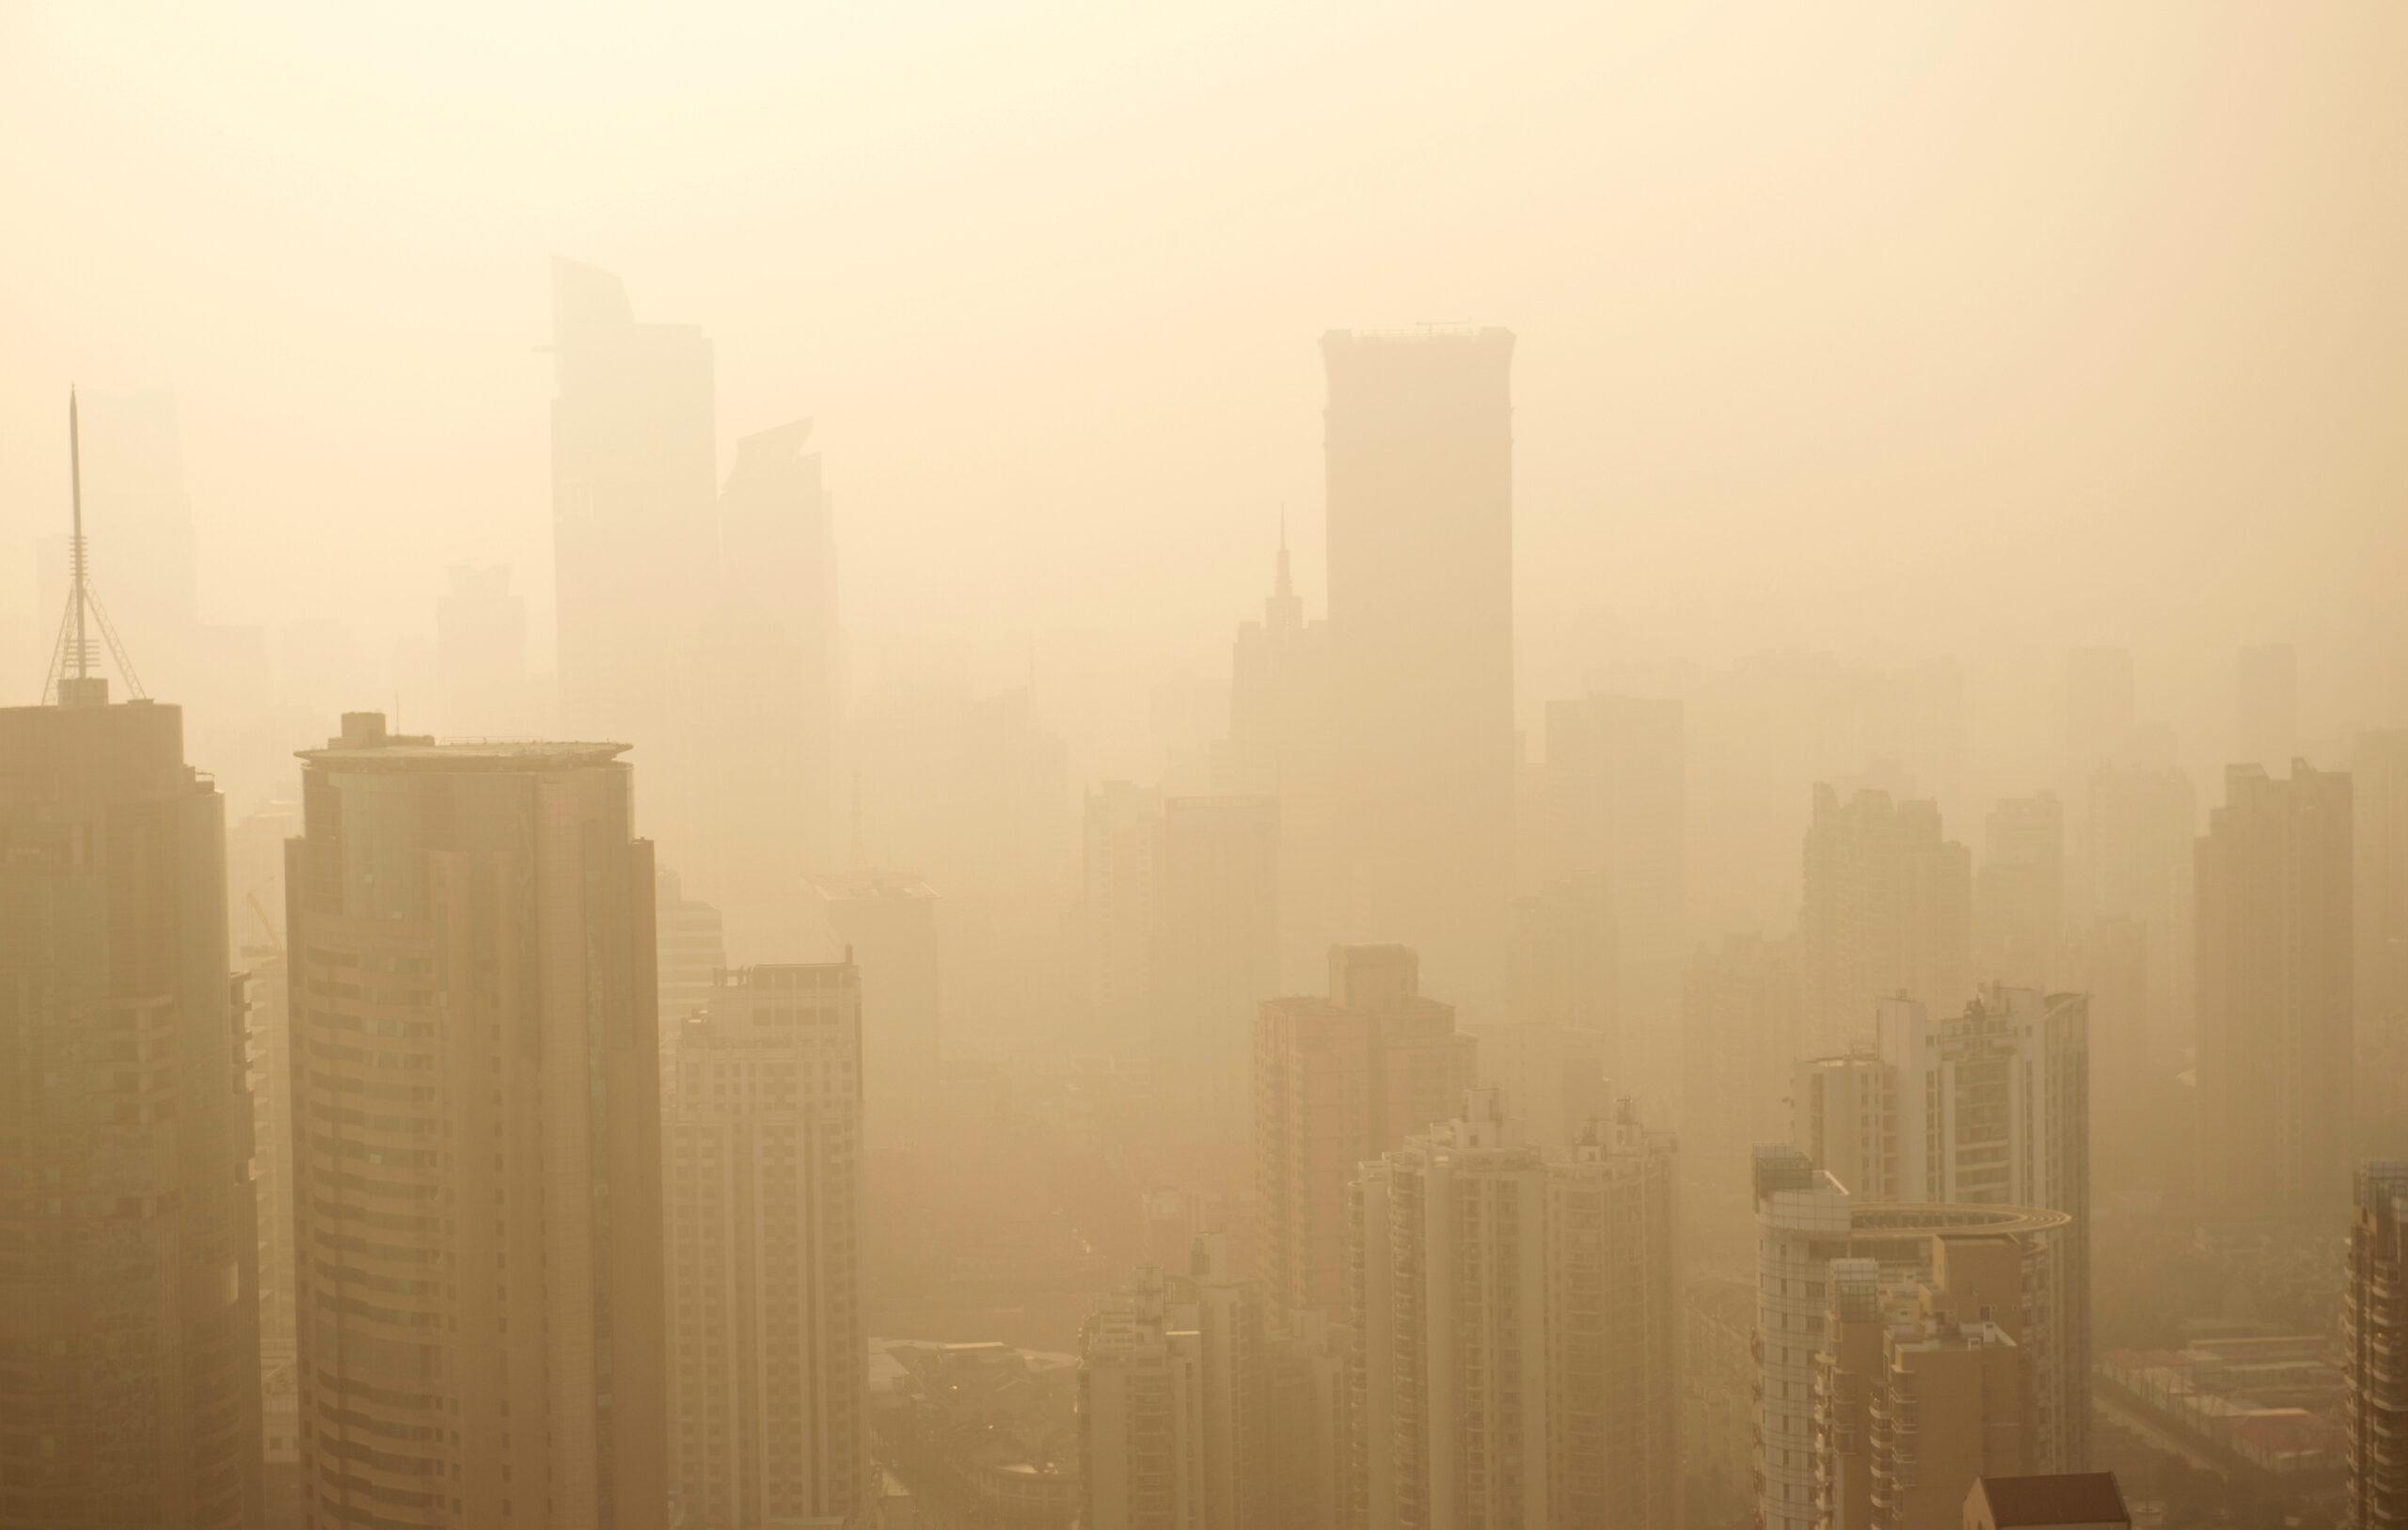 Hazy Orange Polluted City Skyline